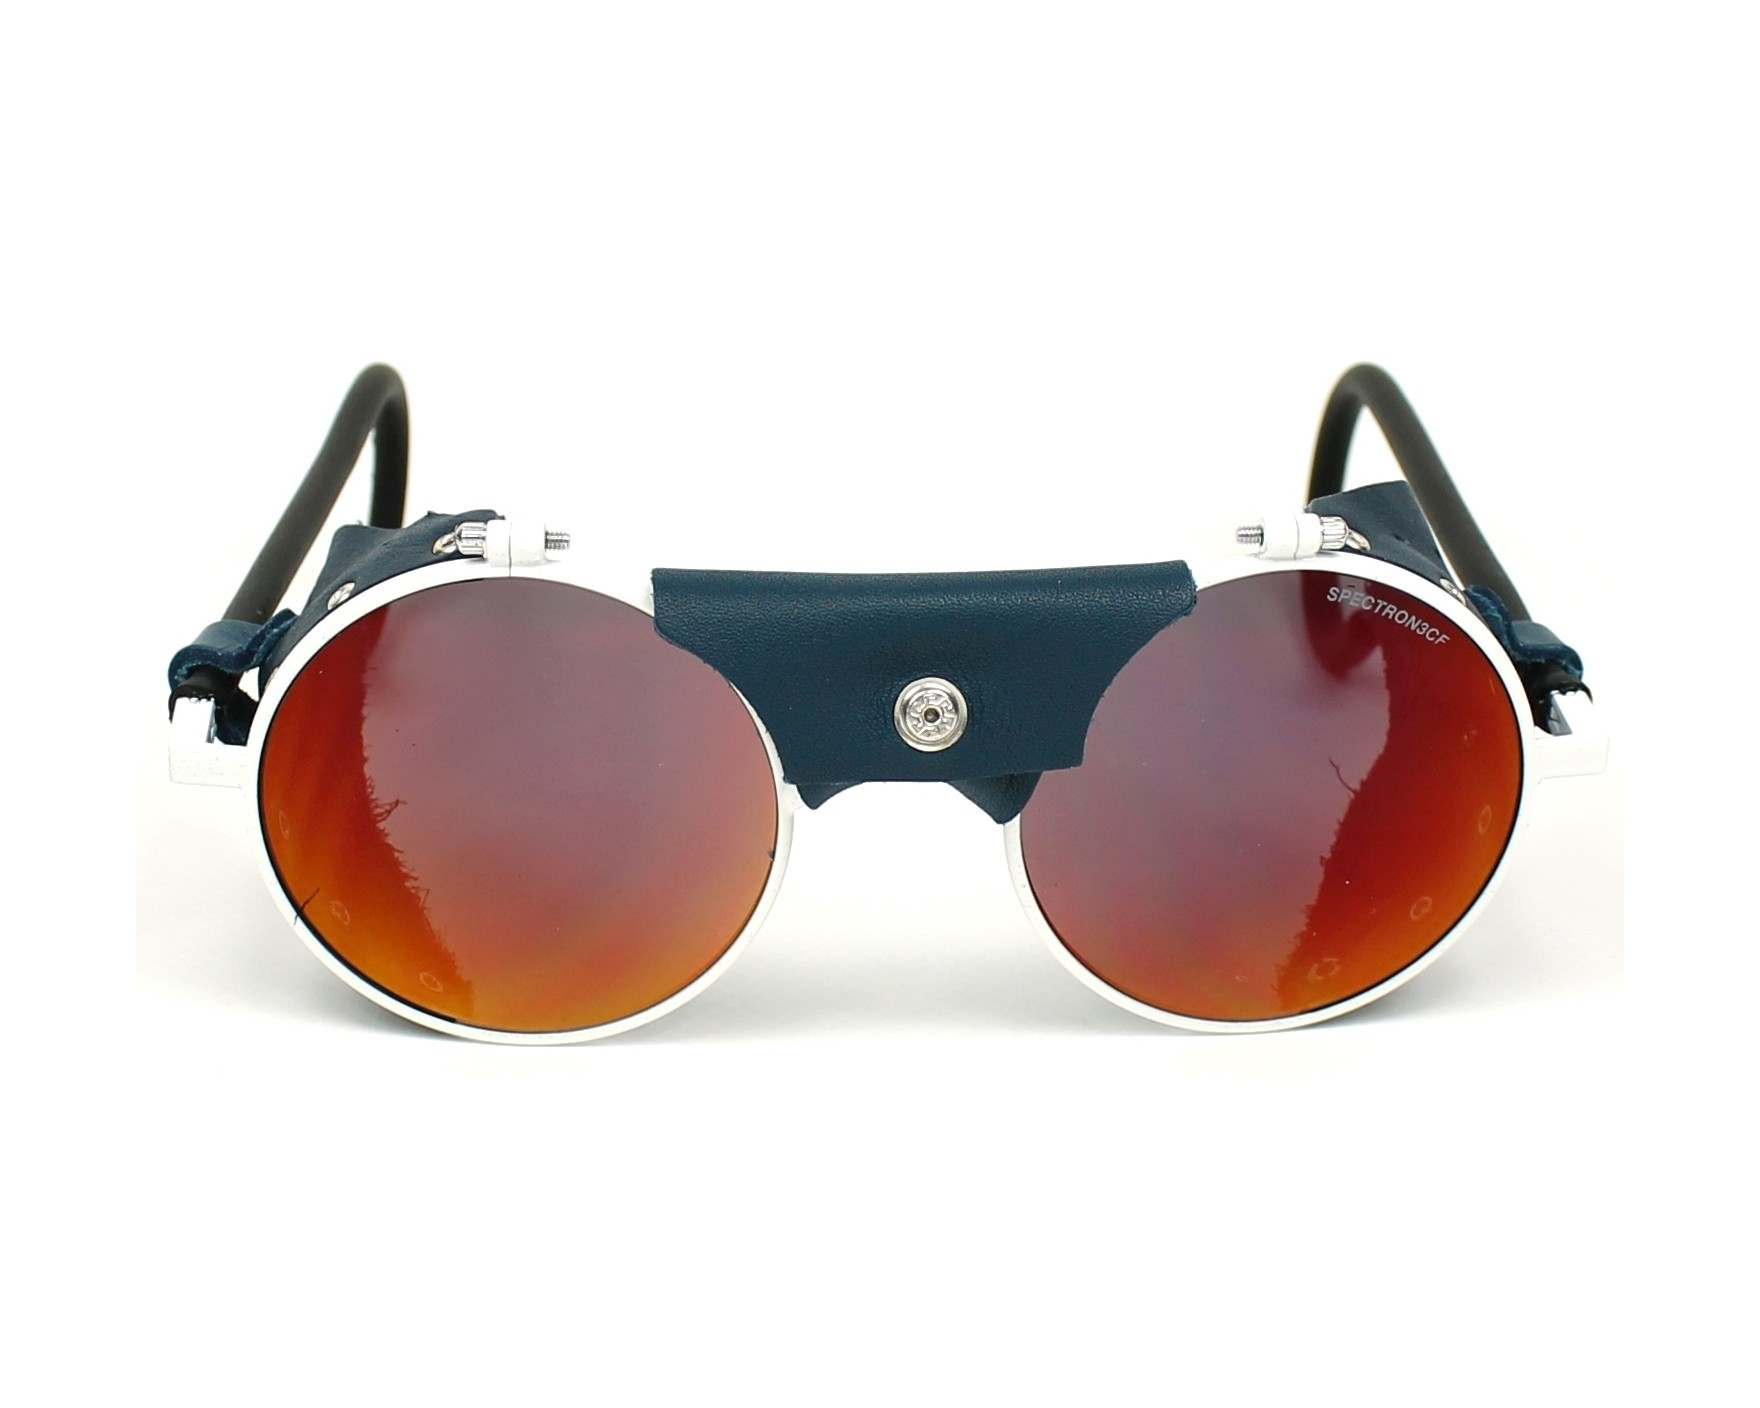 03a400ddf0e Sunglasses Julbo J010 1111 51-23 White Blue front view